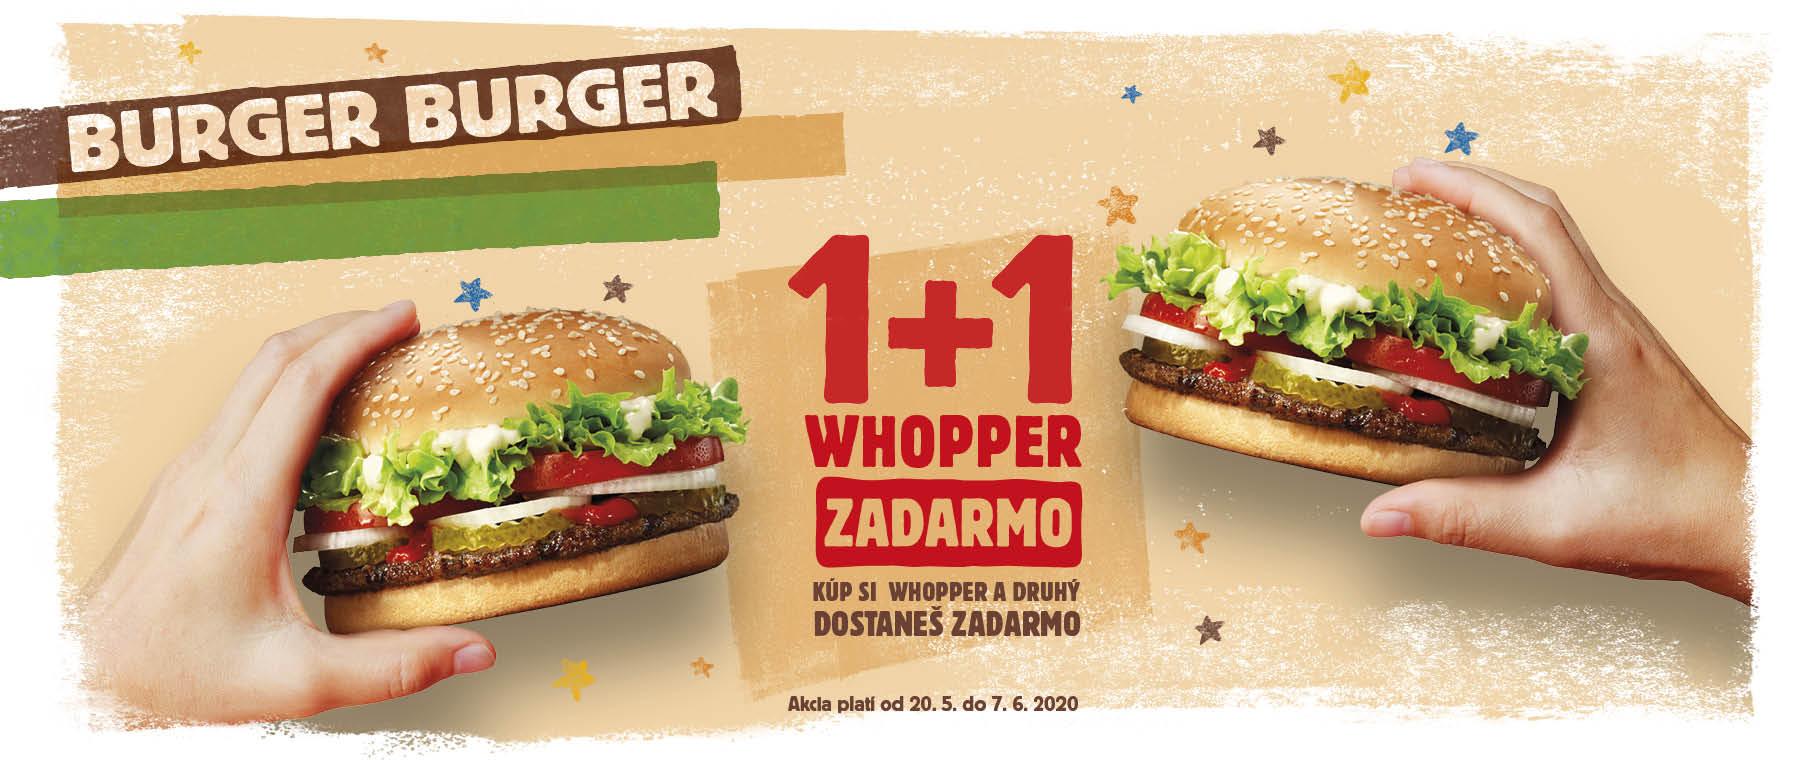 WHOPPER 1 + 1